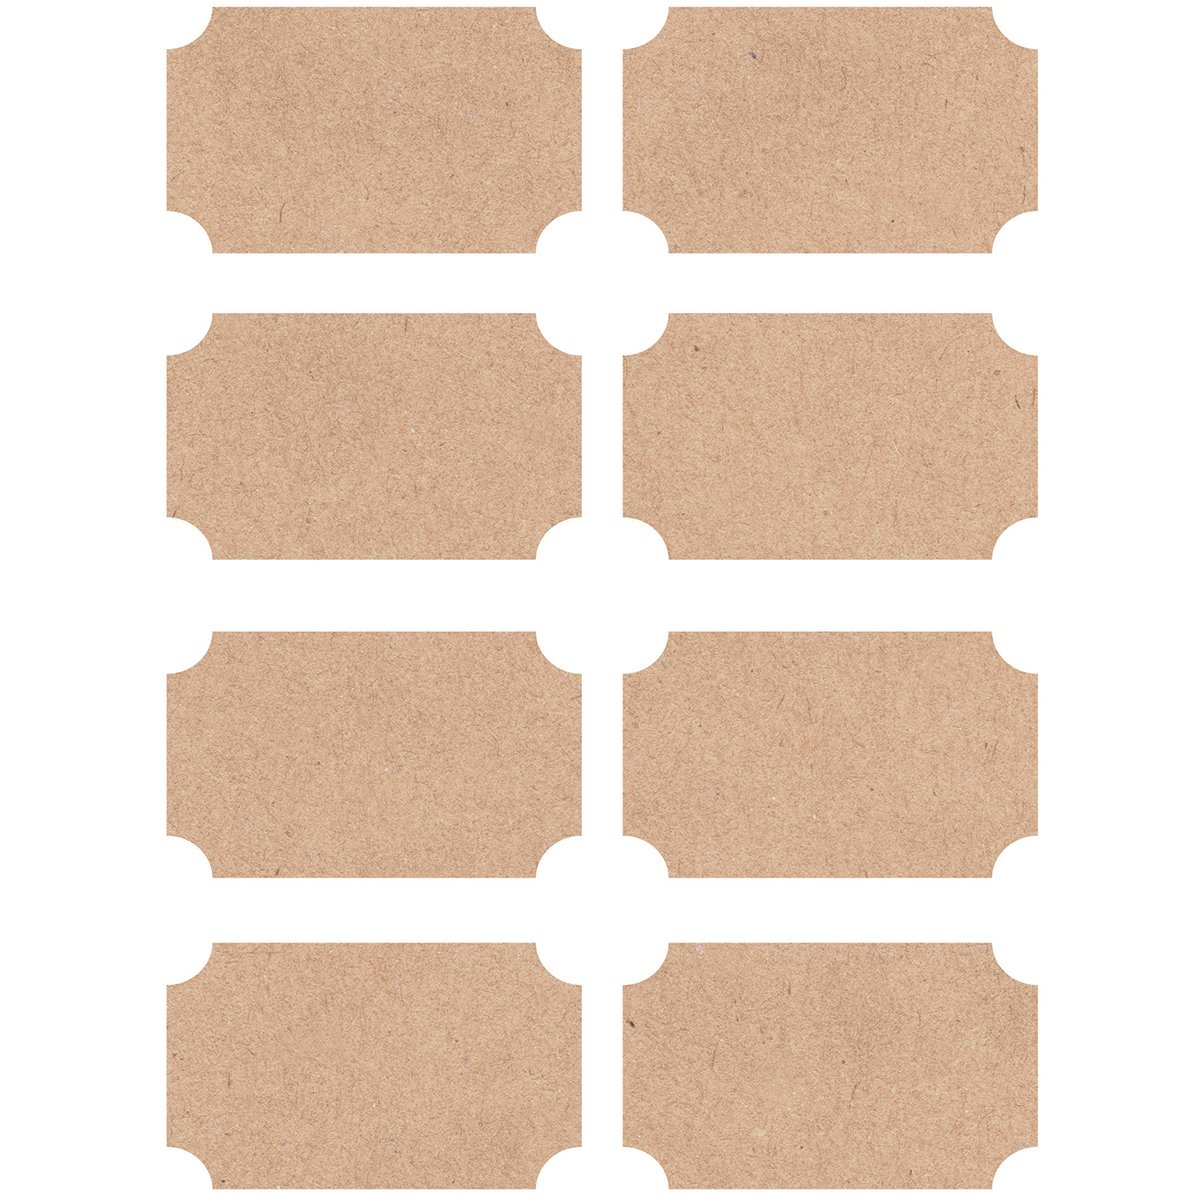 Kaisercraft Lucky Dip Kraft /Étiquettes Autocollants 2,5/x 3,8/cm